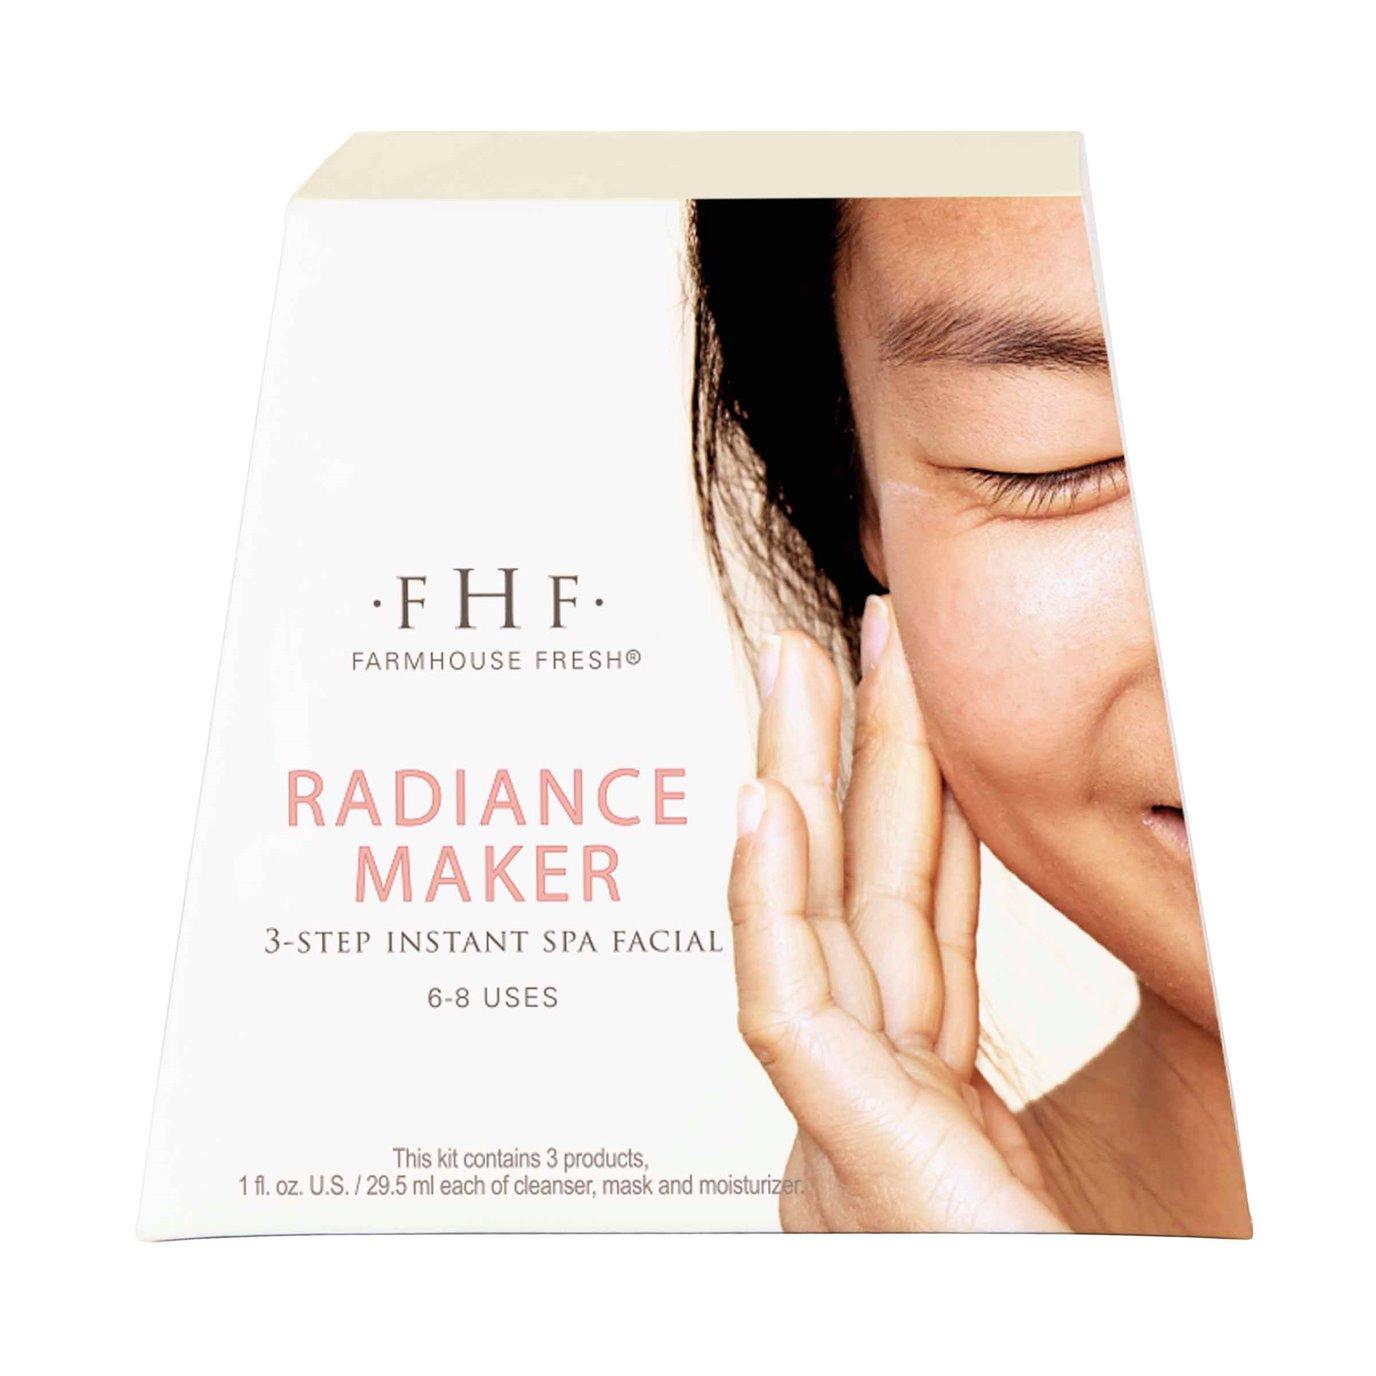 Farmhouse Fresh Radiance Maker Instant Spa Facial Kit